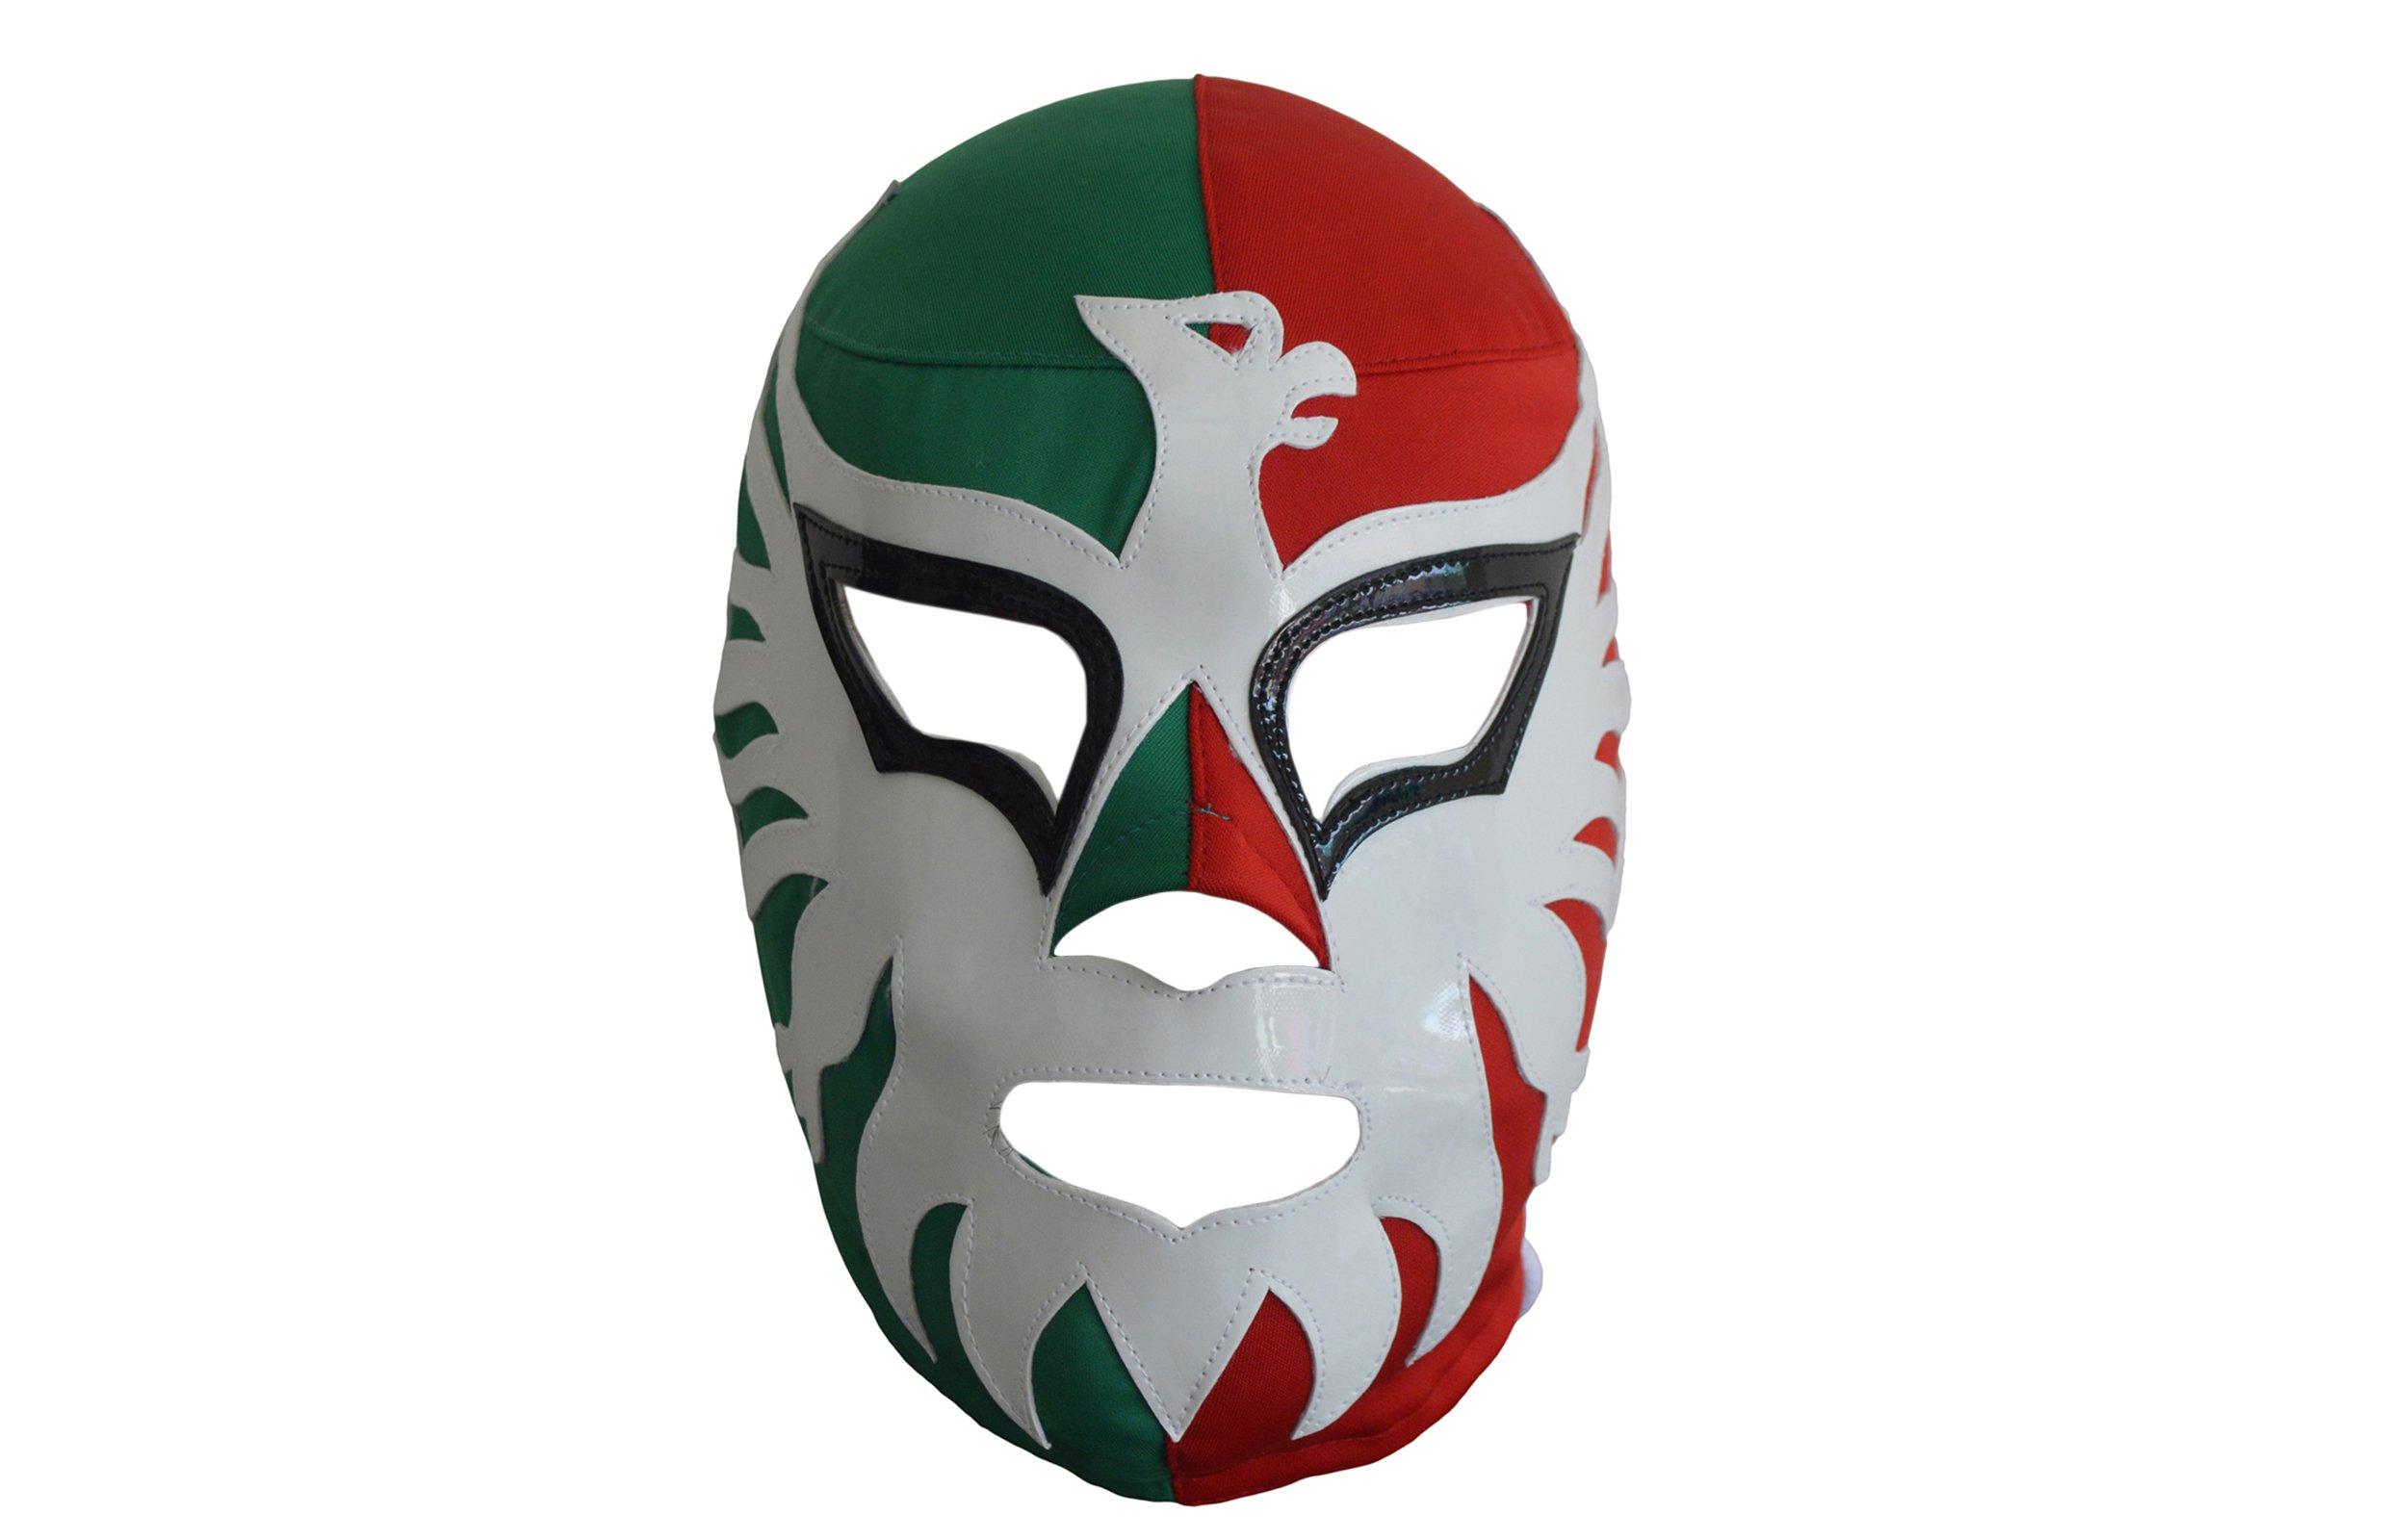 Deportes Martinez El Mexicano Adult Lucha Libre Wrestling Mask Luchador Costume Wear Tricolor